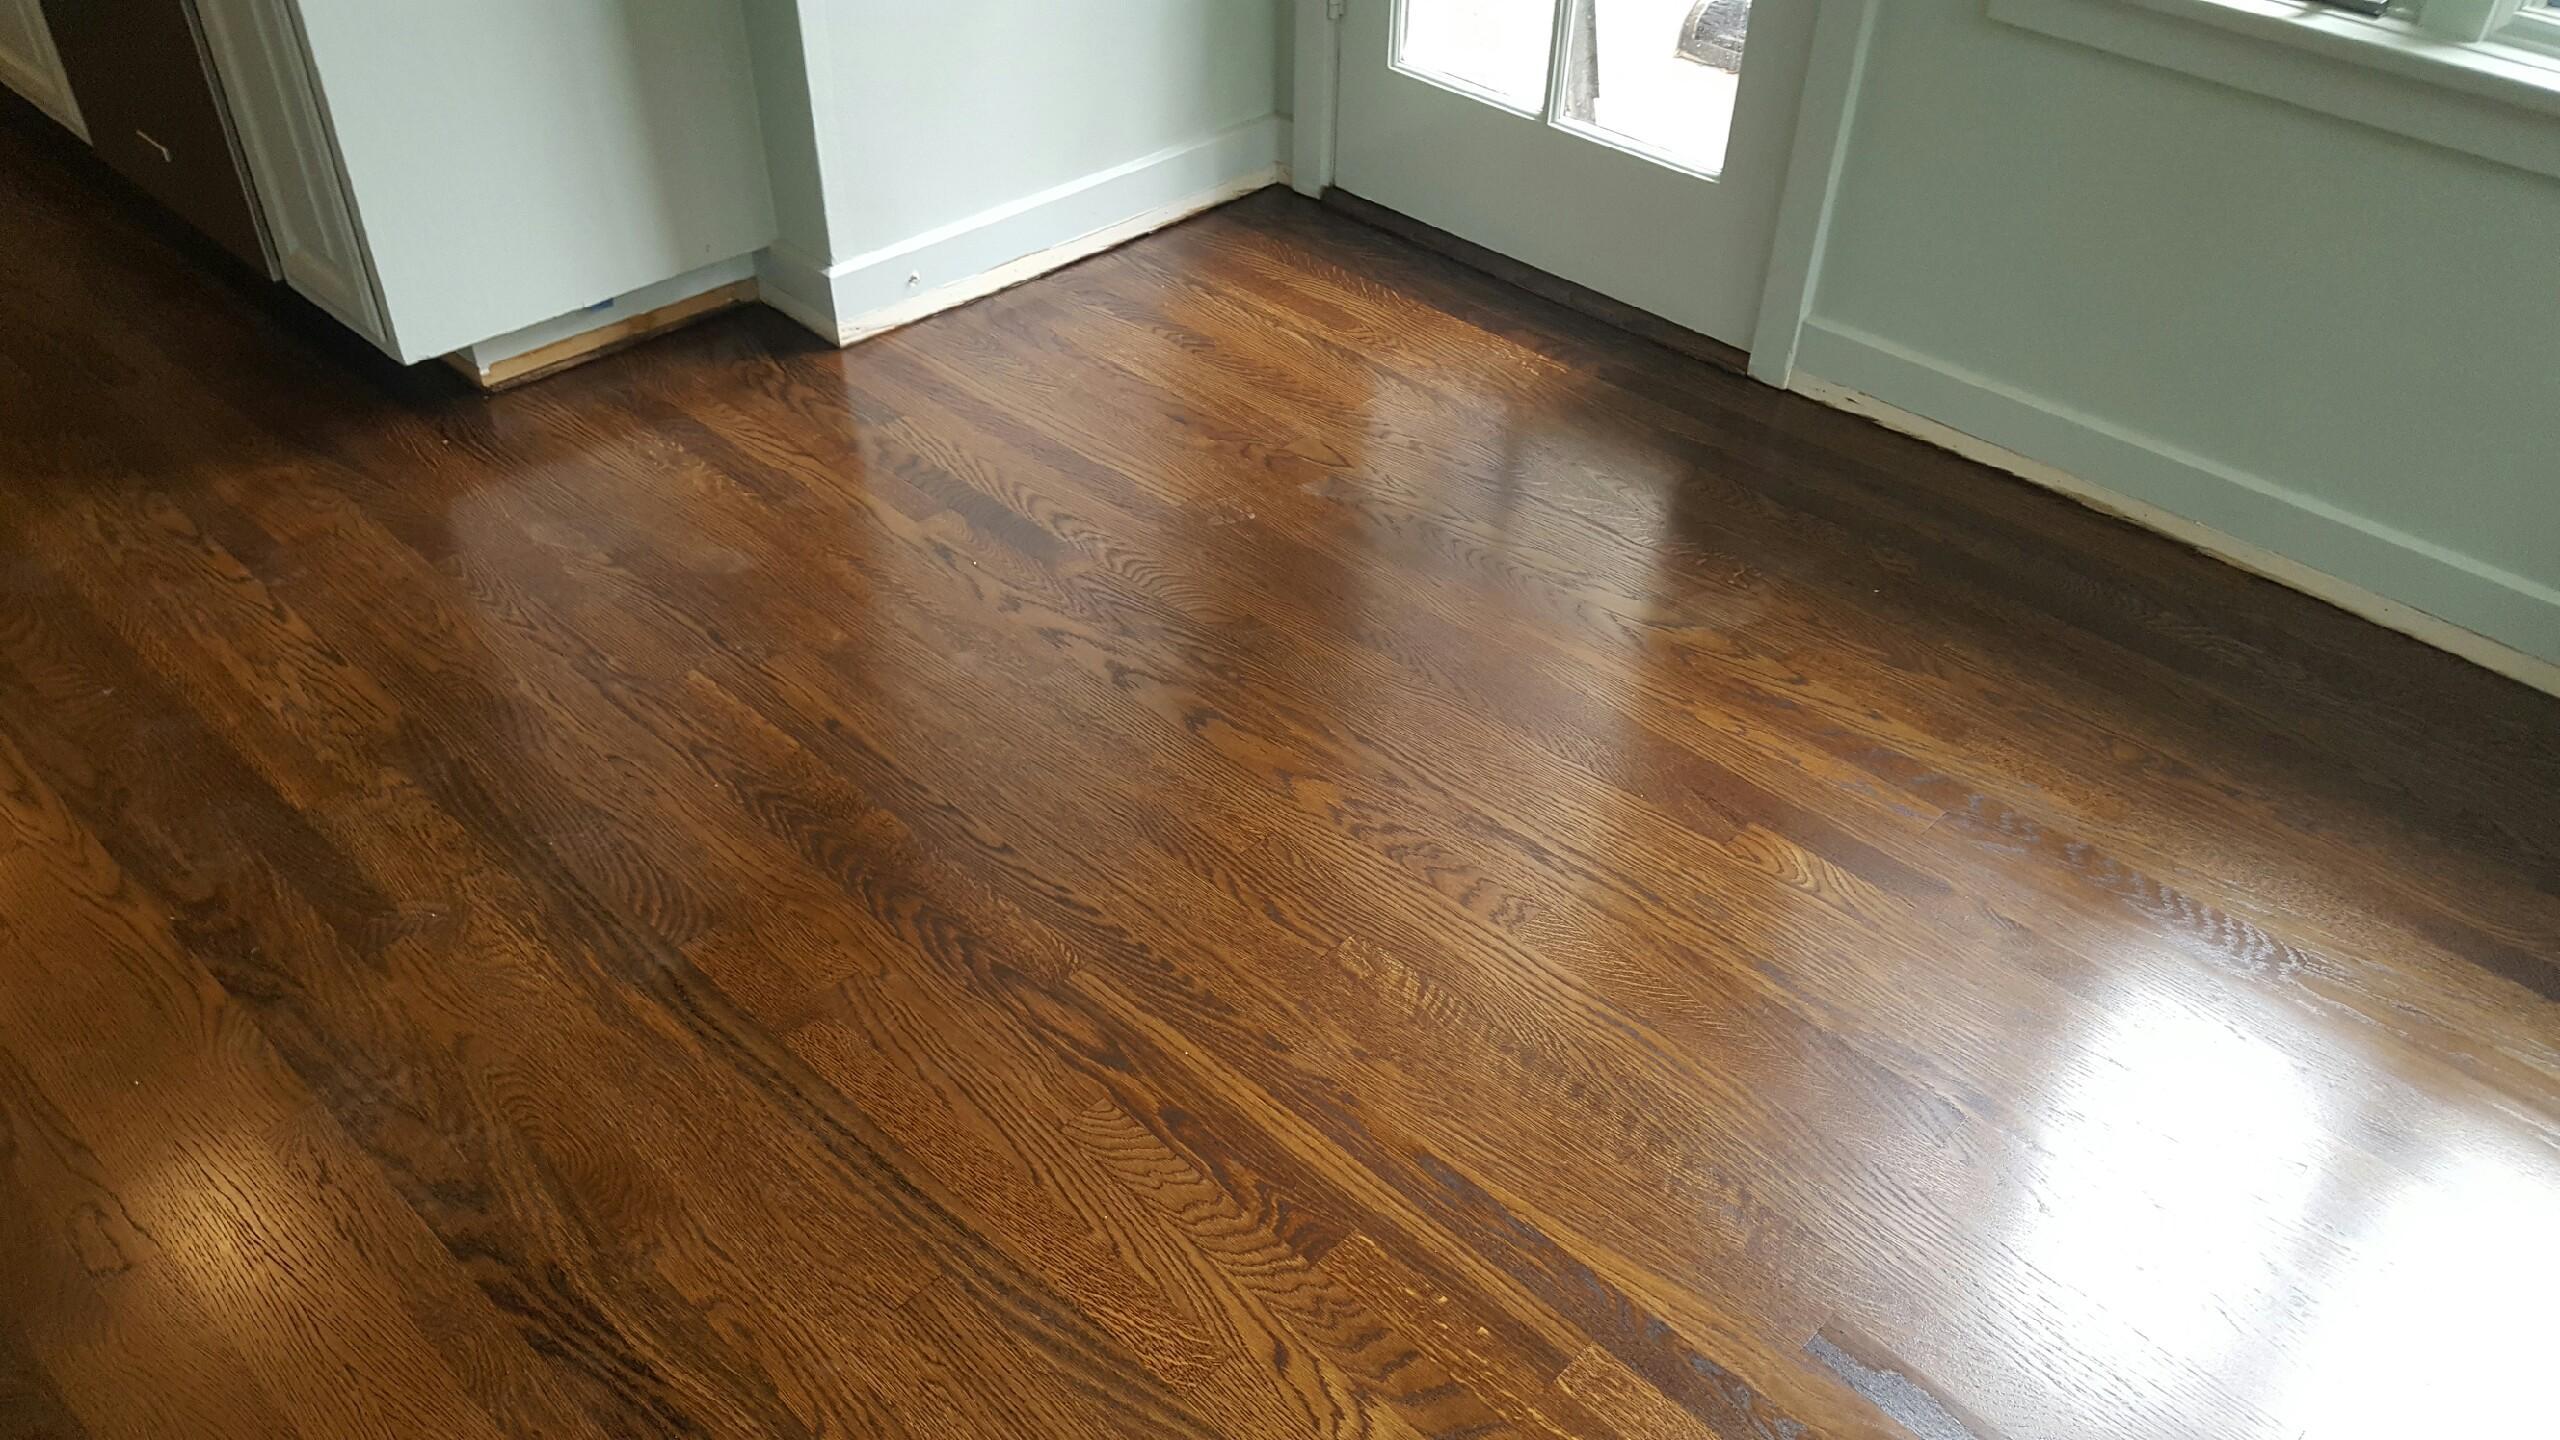 Adkins hardwood floor service in pasadena ca 91103 for Pasadena floors